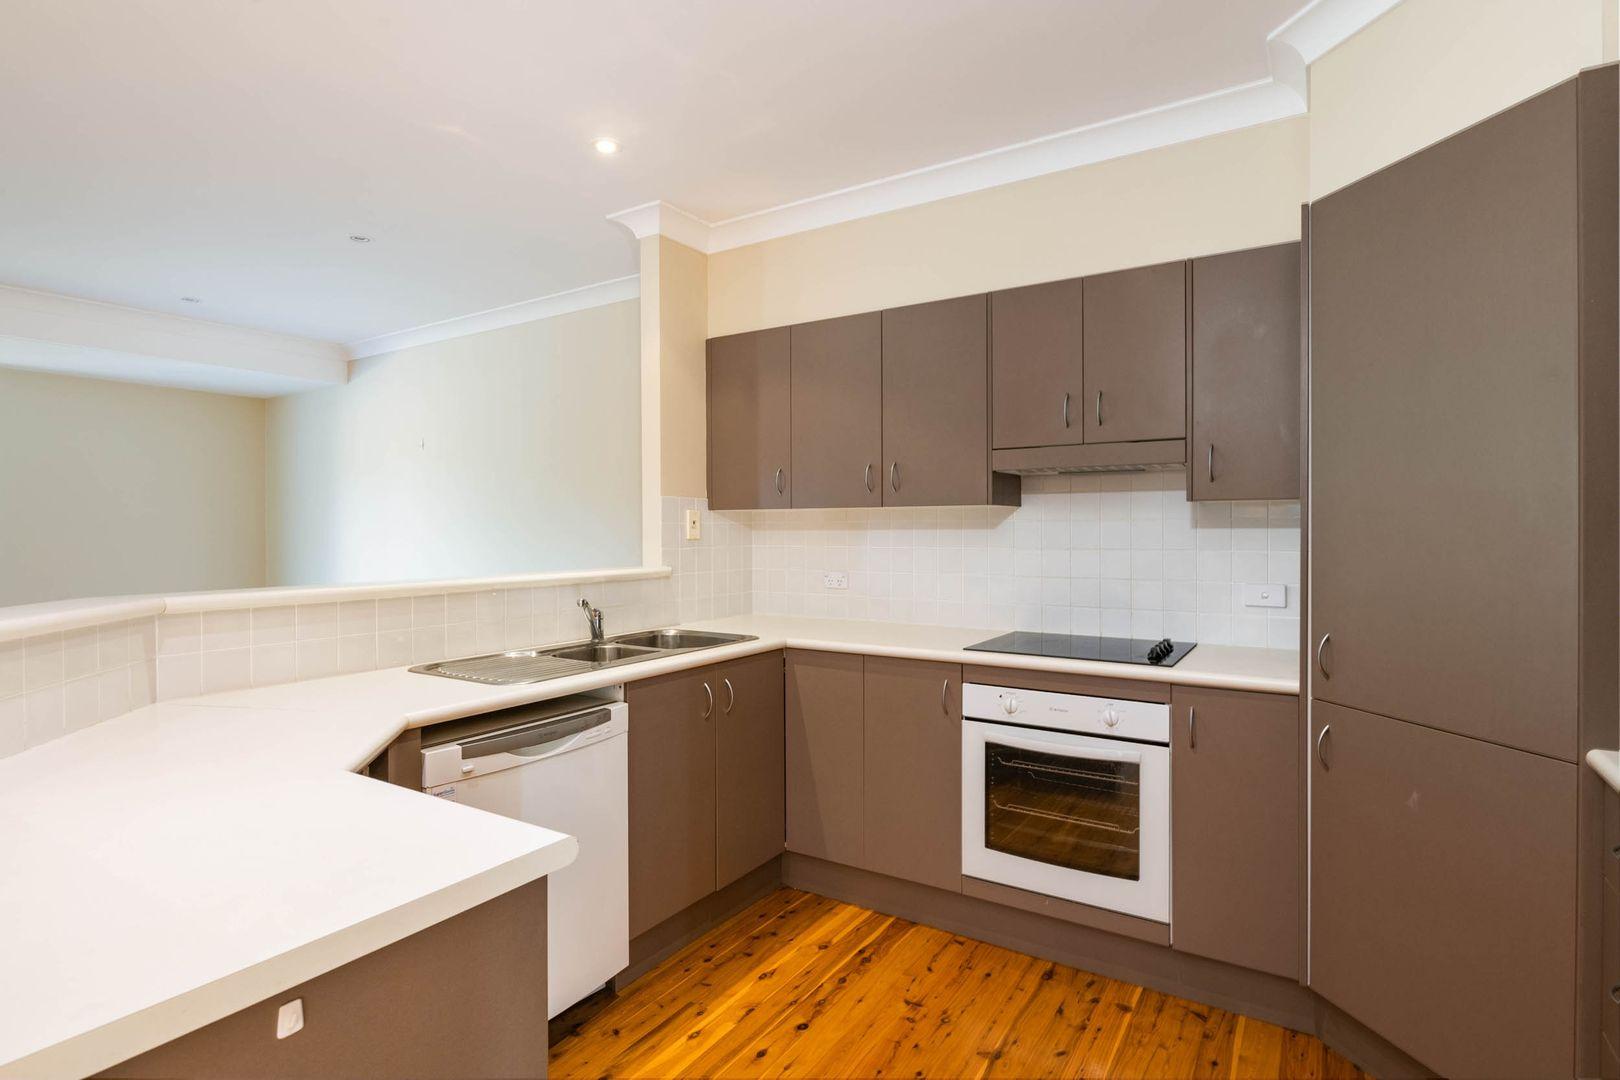 2/21 Kwinana Lane, Port Macquarie NSW 2444, Image 1